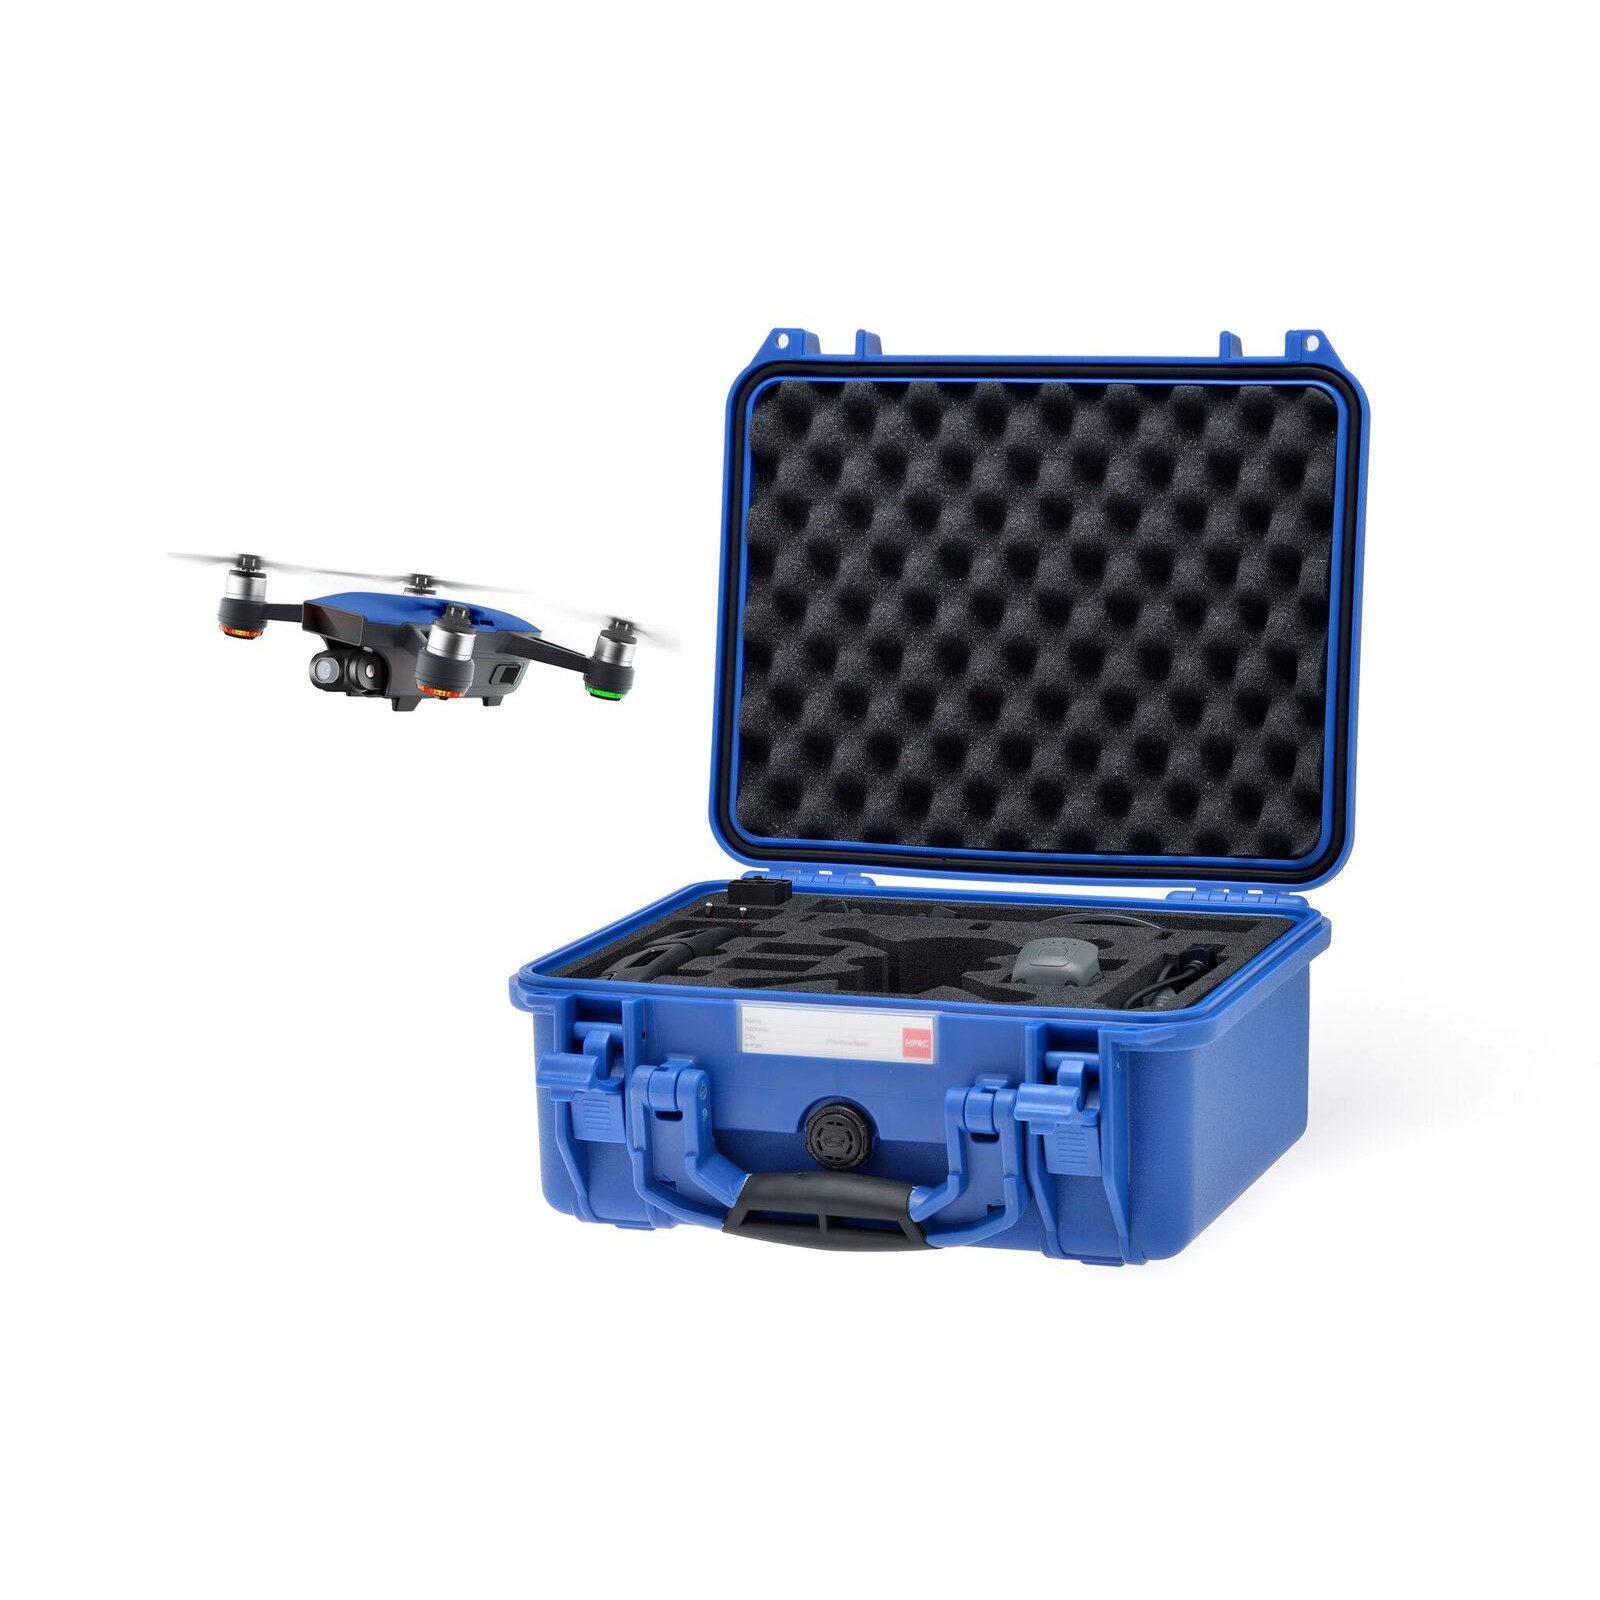 HPRC 2300 koffer voor DJI Spark Blauw